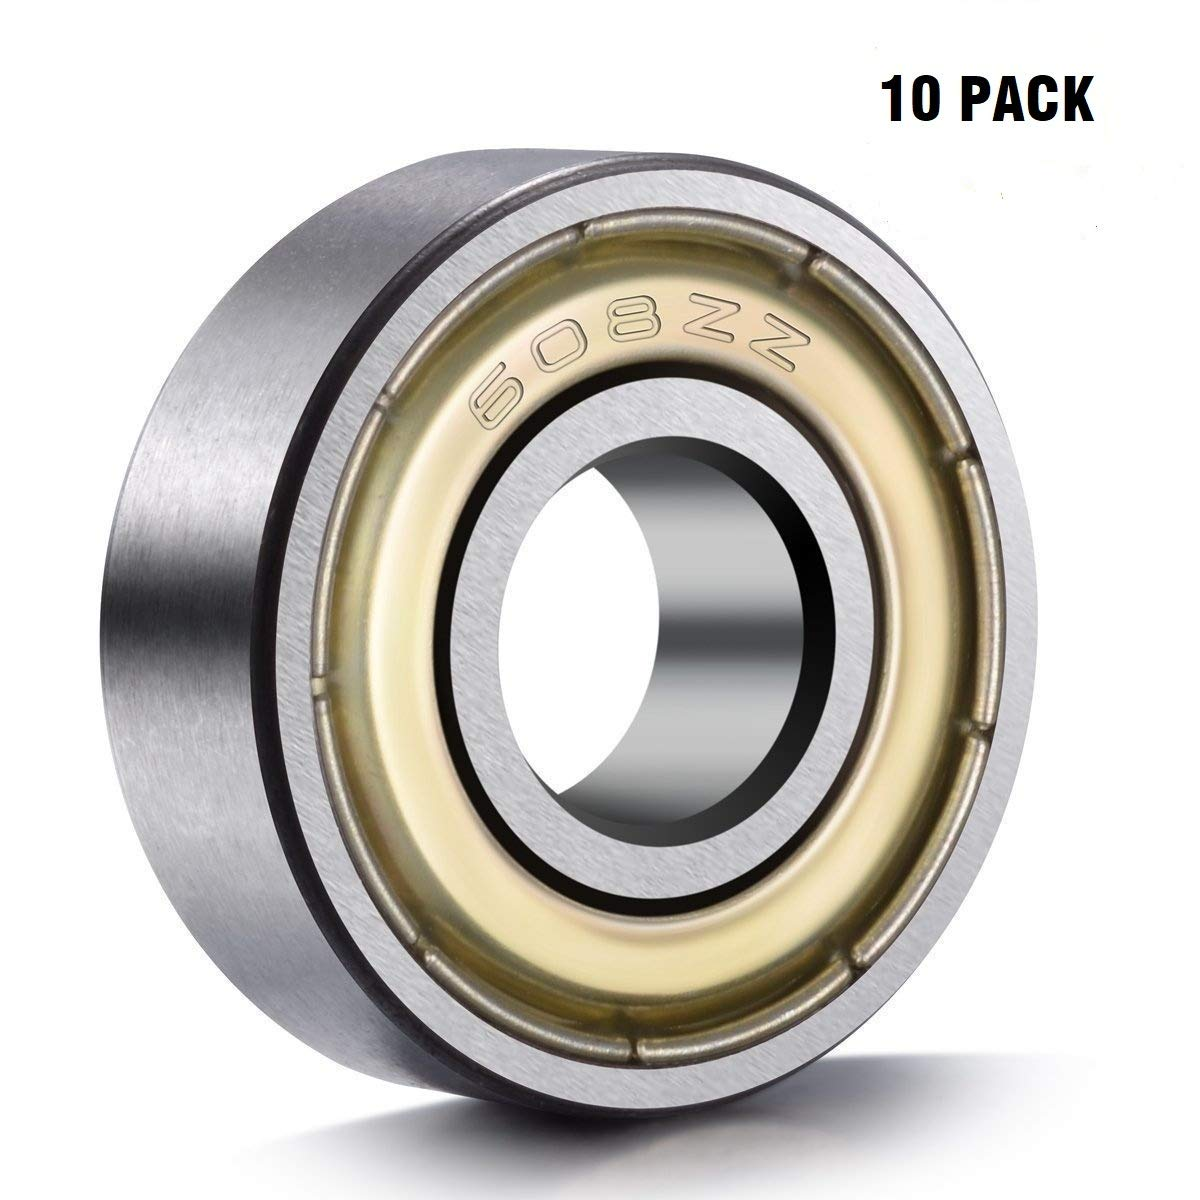 10pcs Ball Bearings 8mmx22mmx7mm 608ZZ  for 3D Printer with box